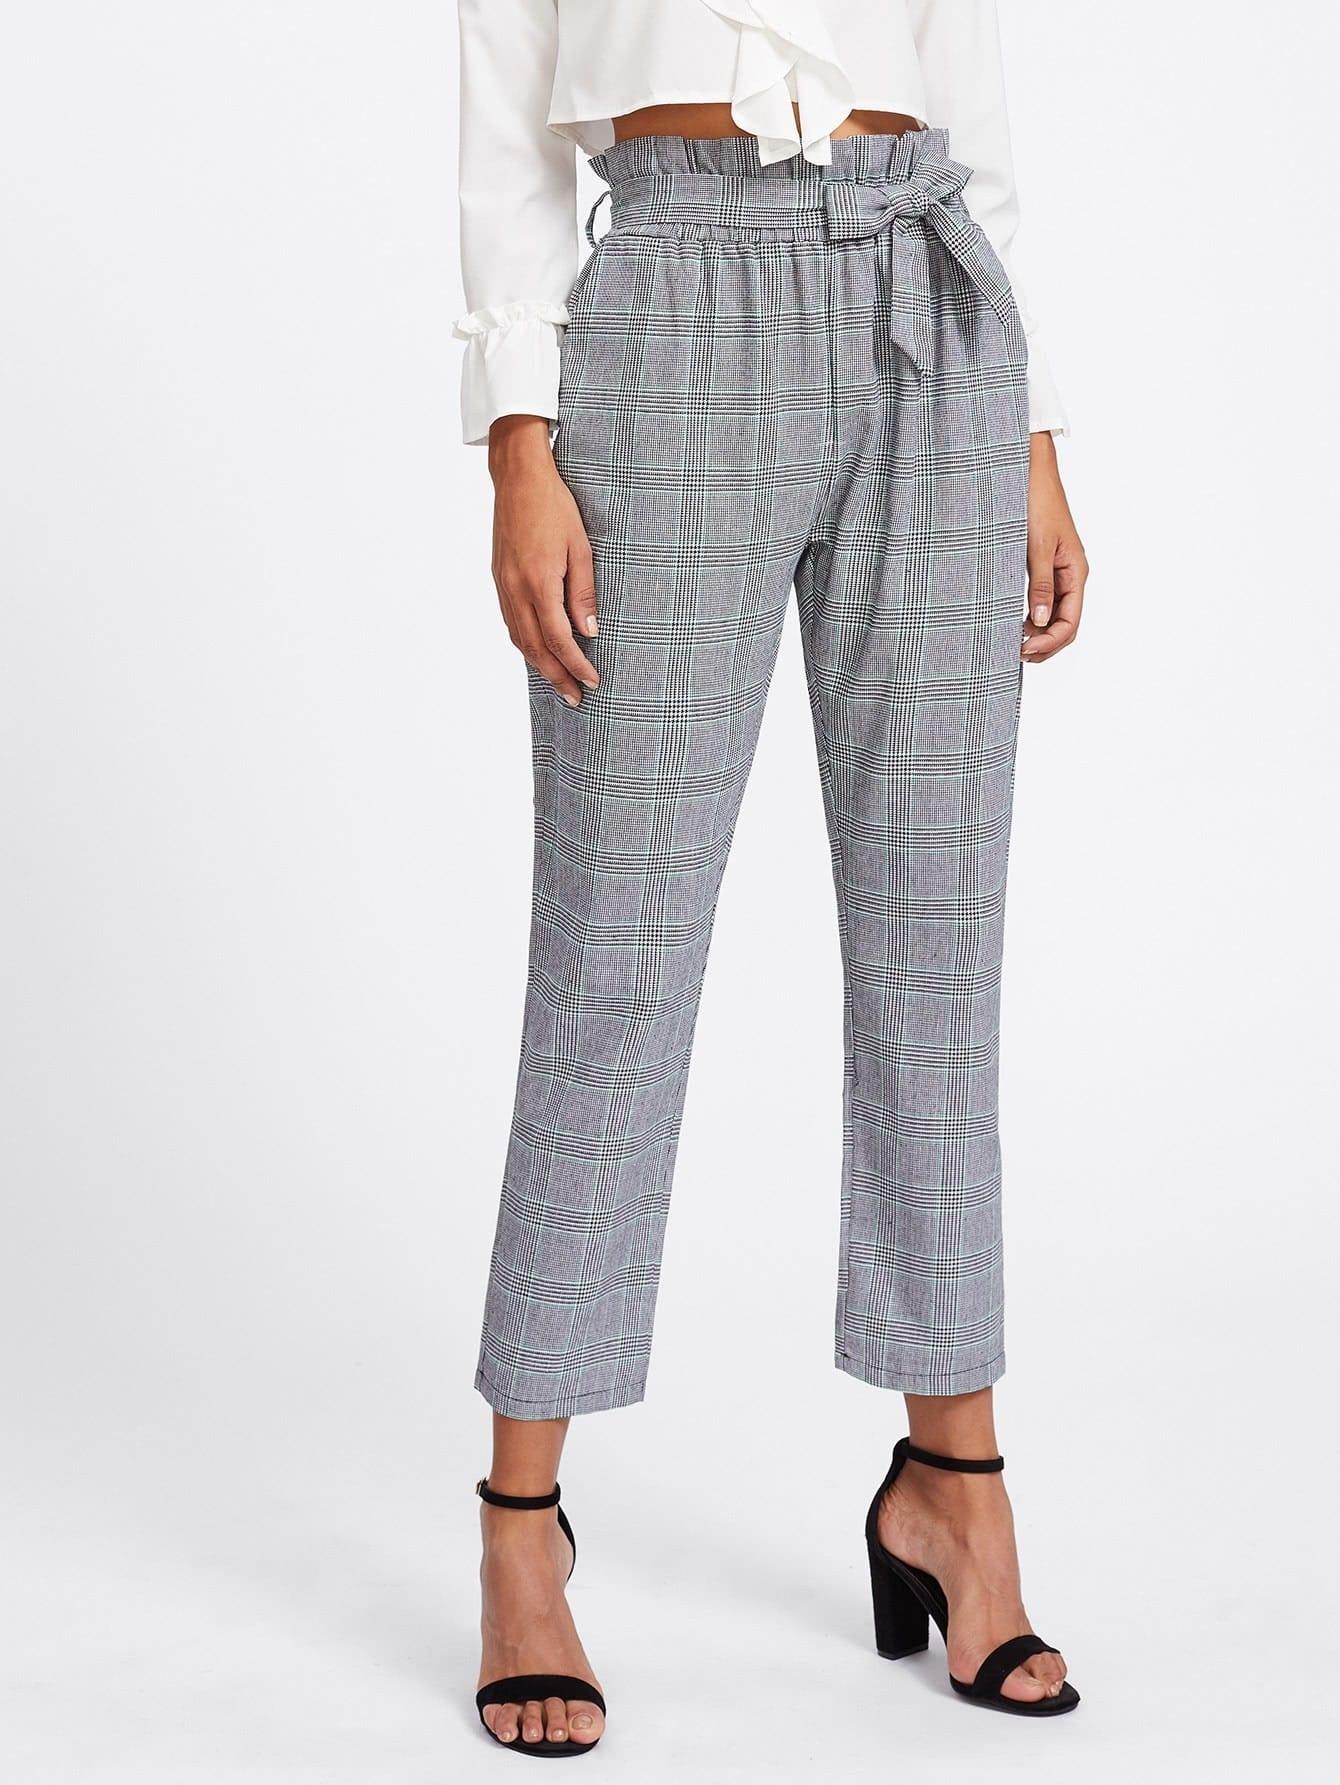 Tie Waist Glen Plaid Frill Pants dark grey tie waist sports pants